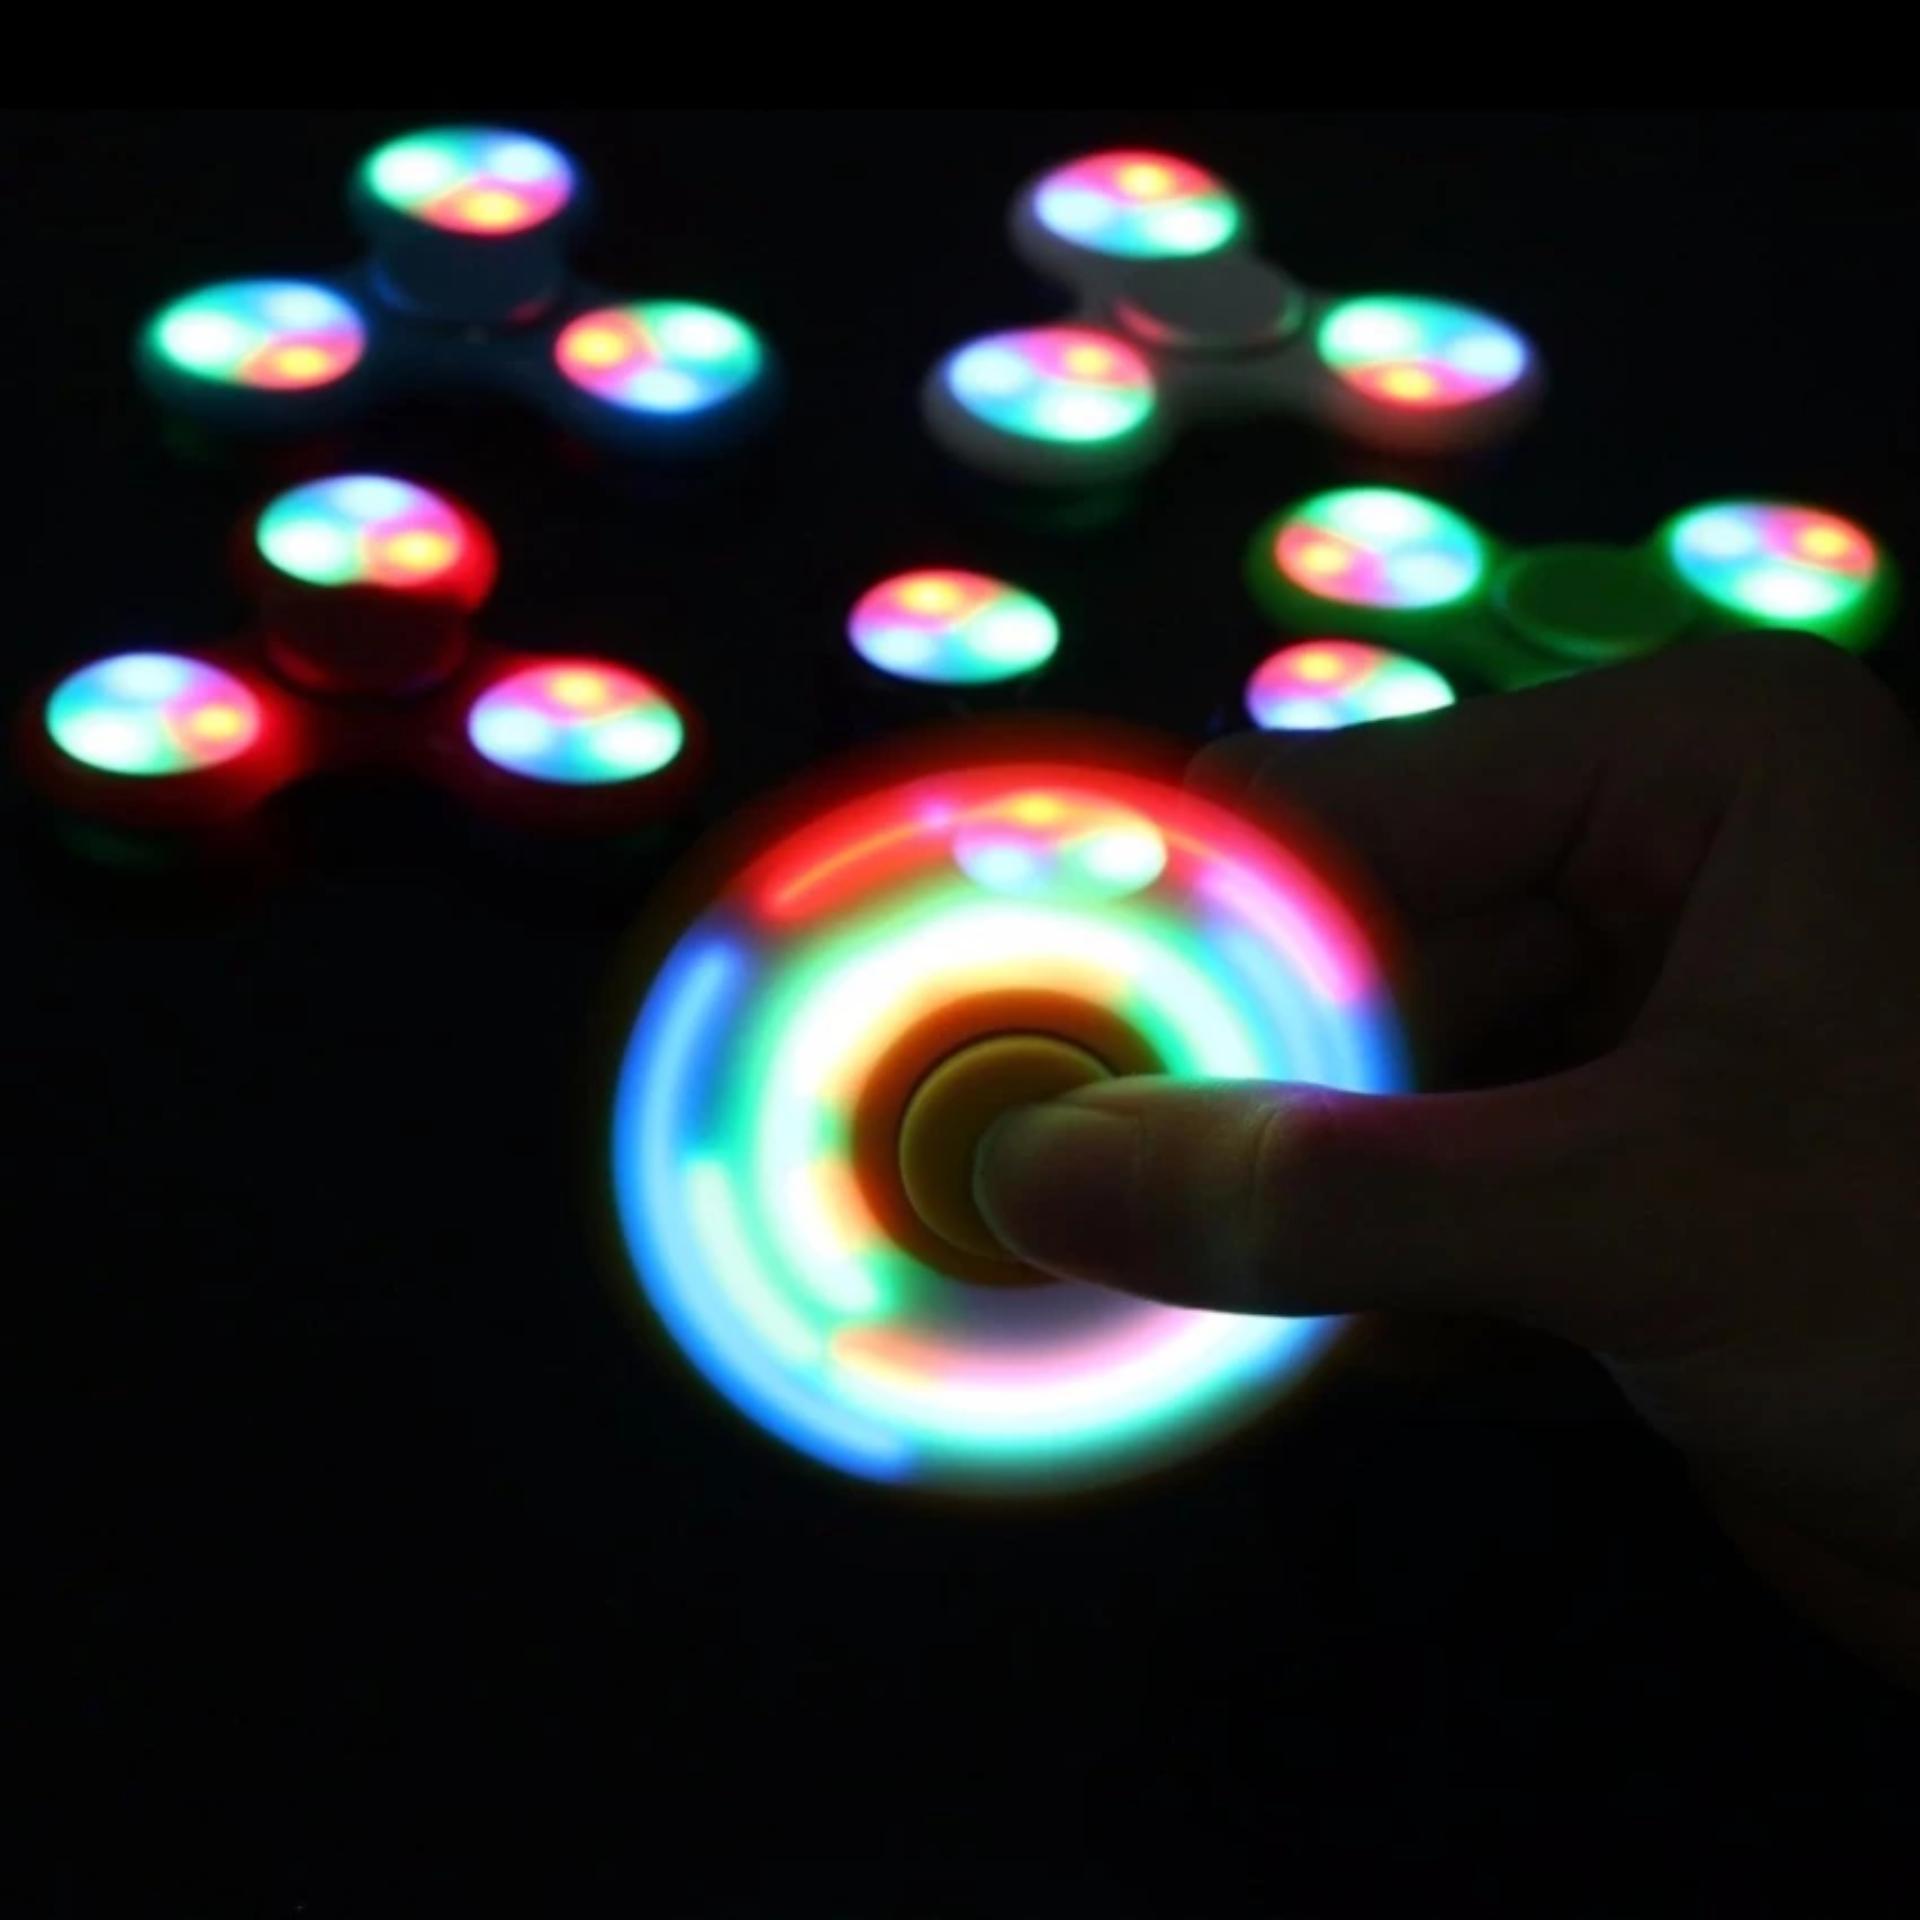 AIUEO Fidget Spinner LED New Exotic Hand Toys Mainan Tri Spinner EDC Focus .